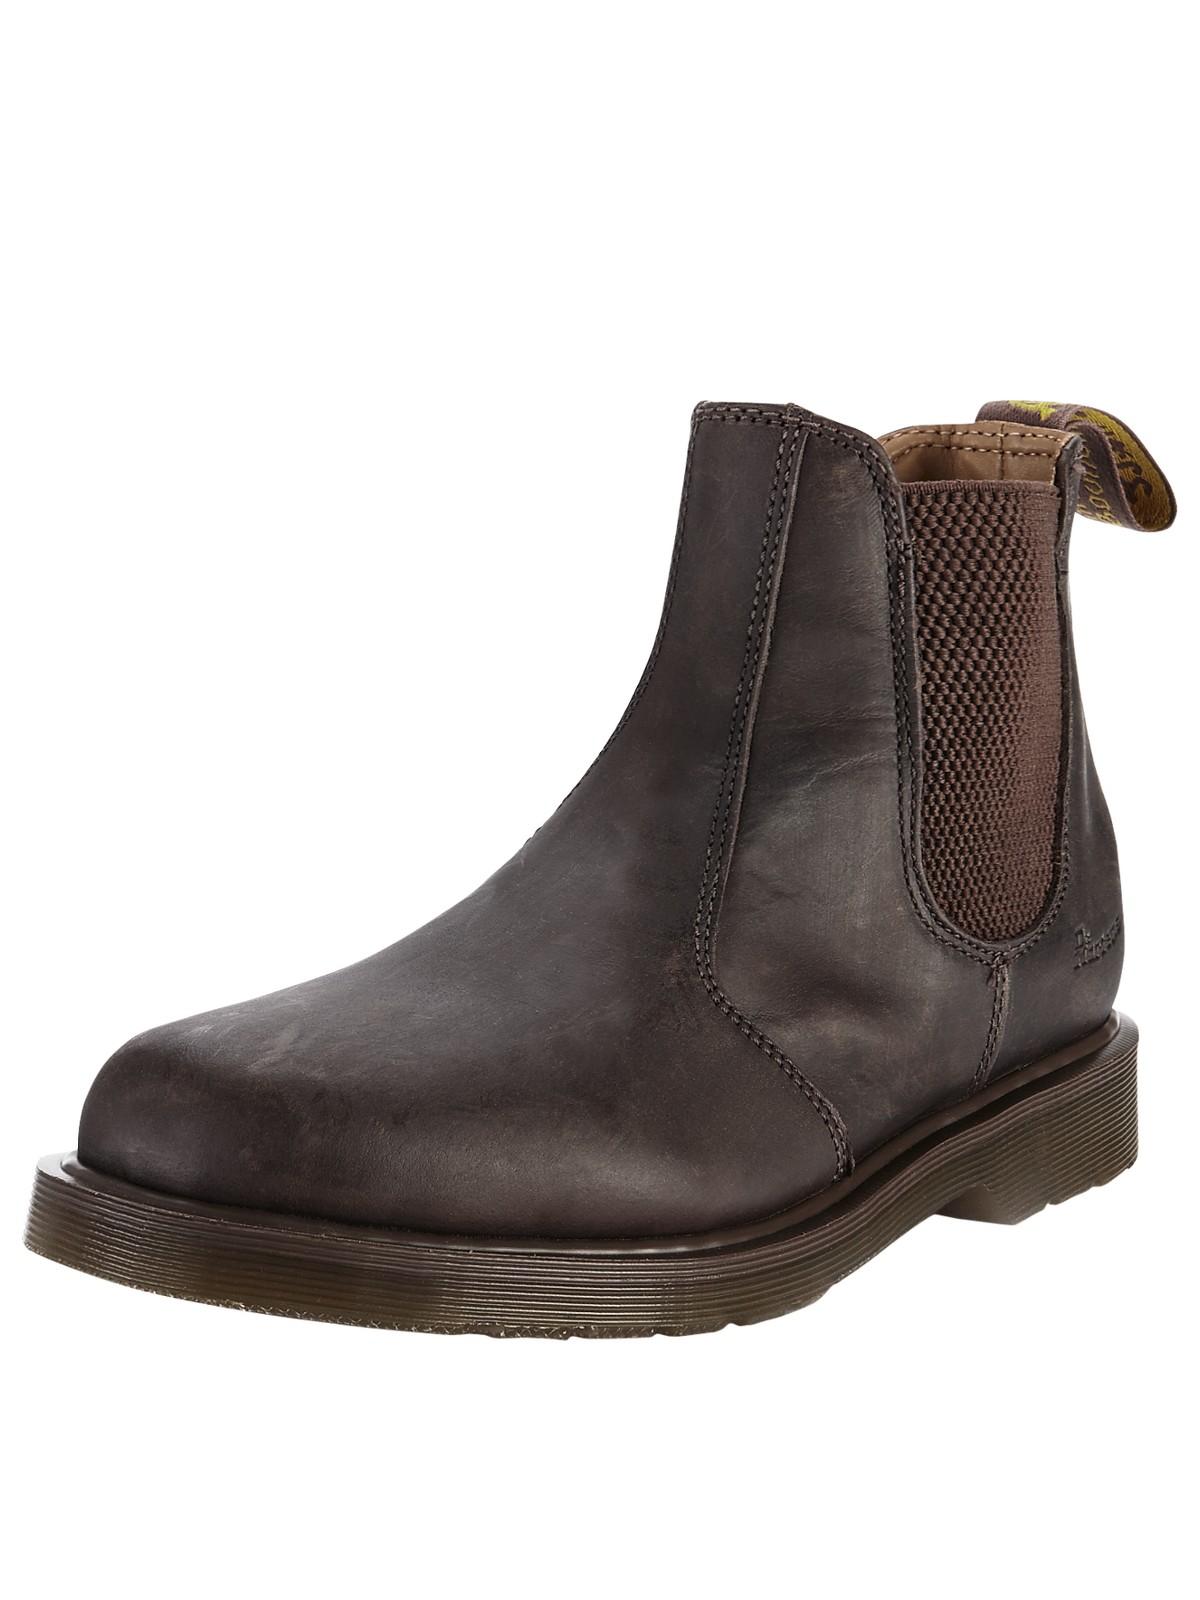 dr martens dr martens chelsea boot crazy horse in brown for men gaucho lyst. Black Bedroom Furniture Sets. Home Design Ideas